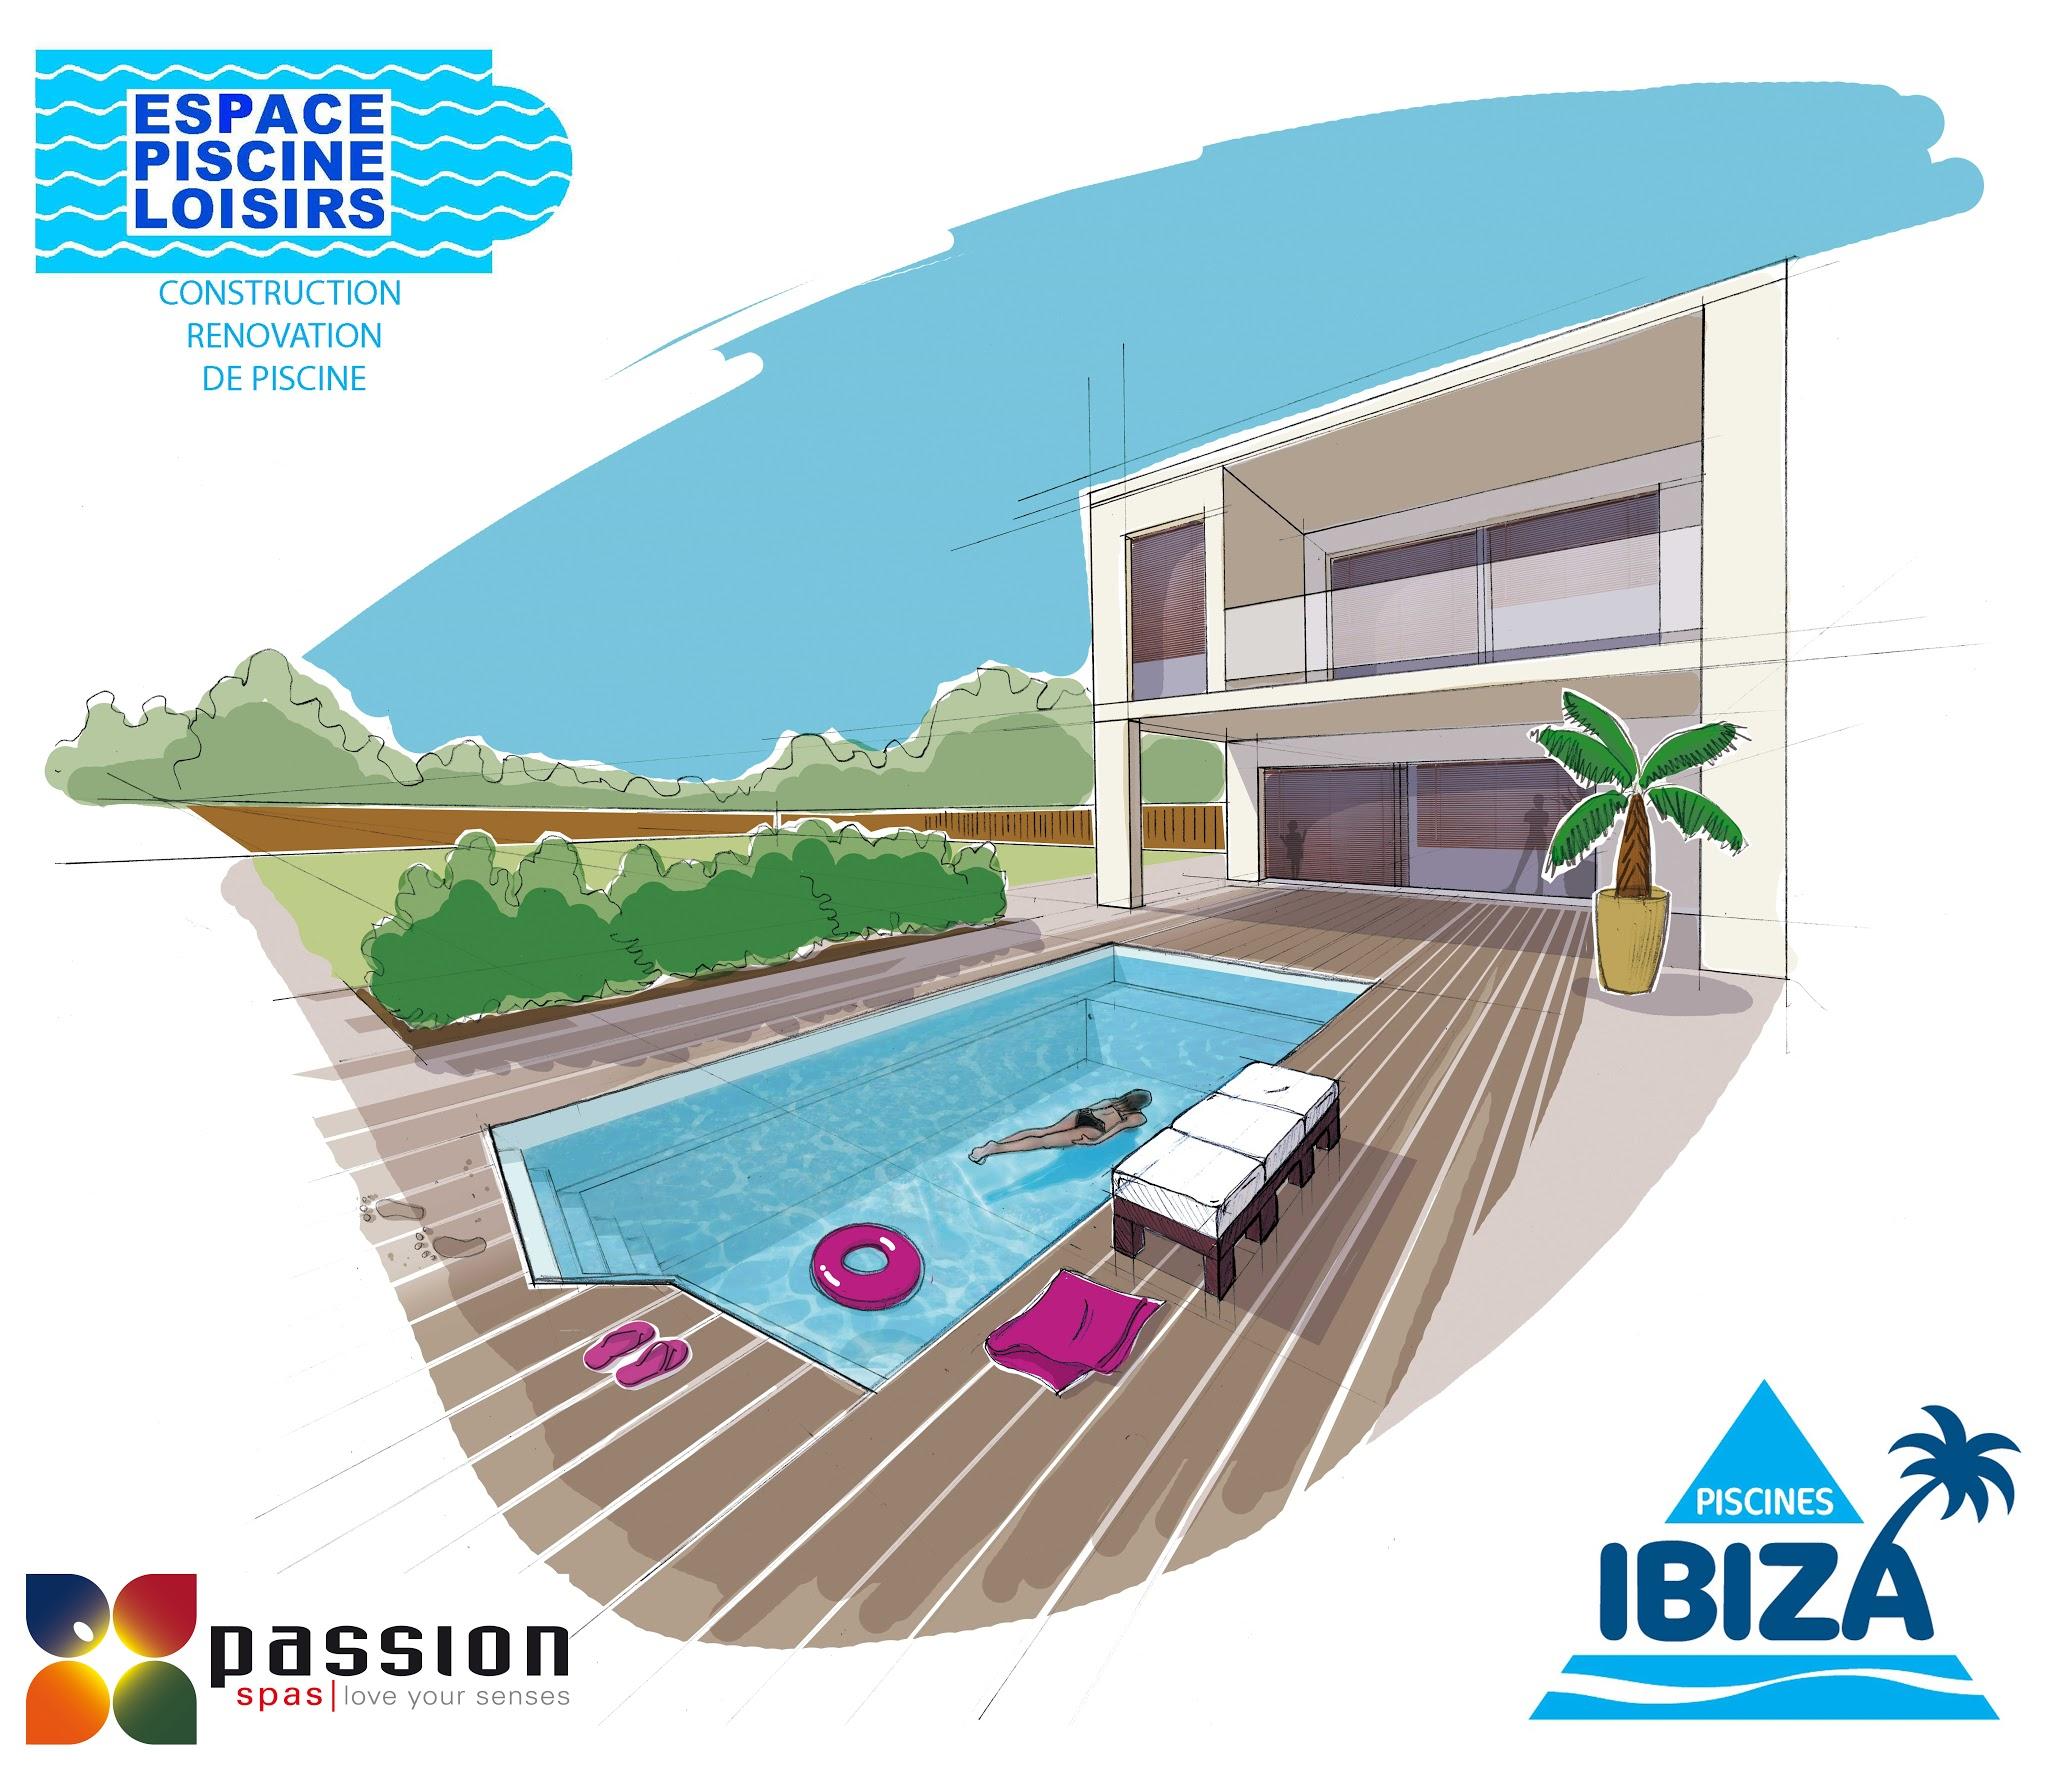 Espace piscine loisirs for Piscine passion